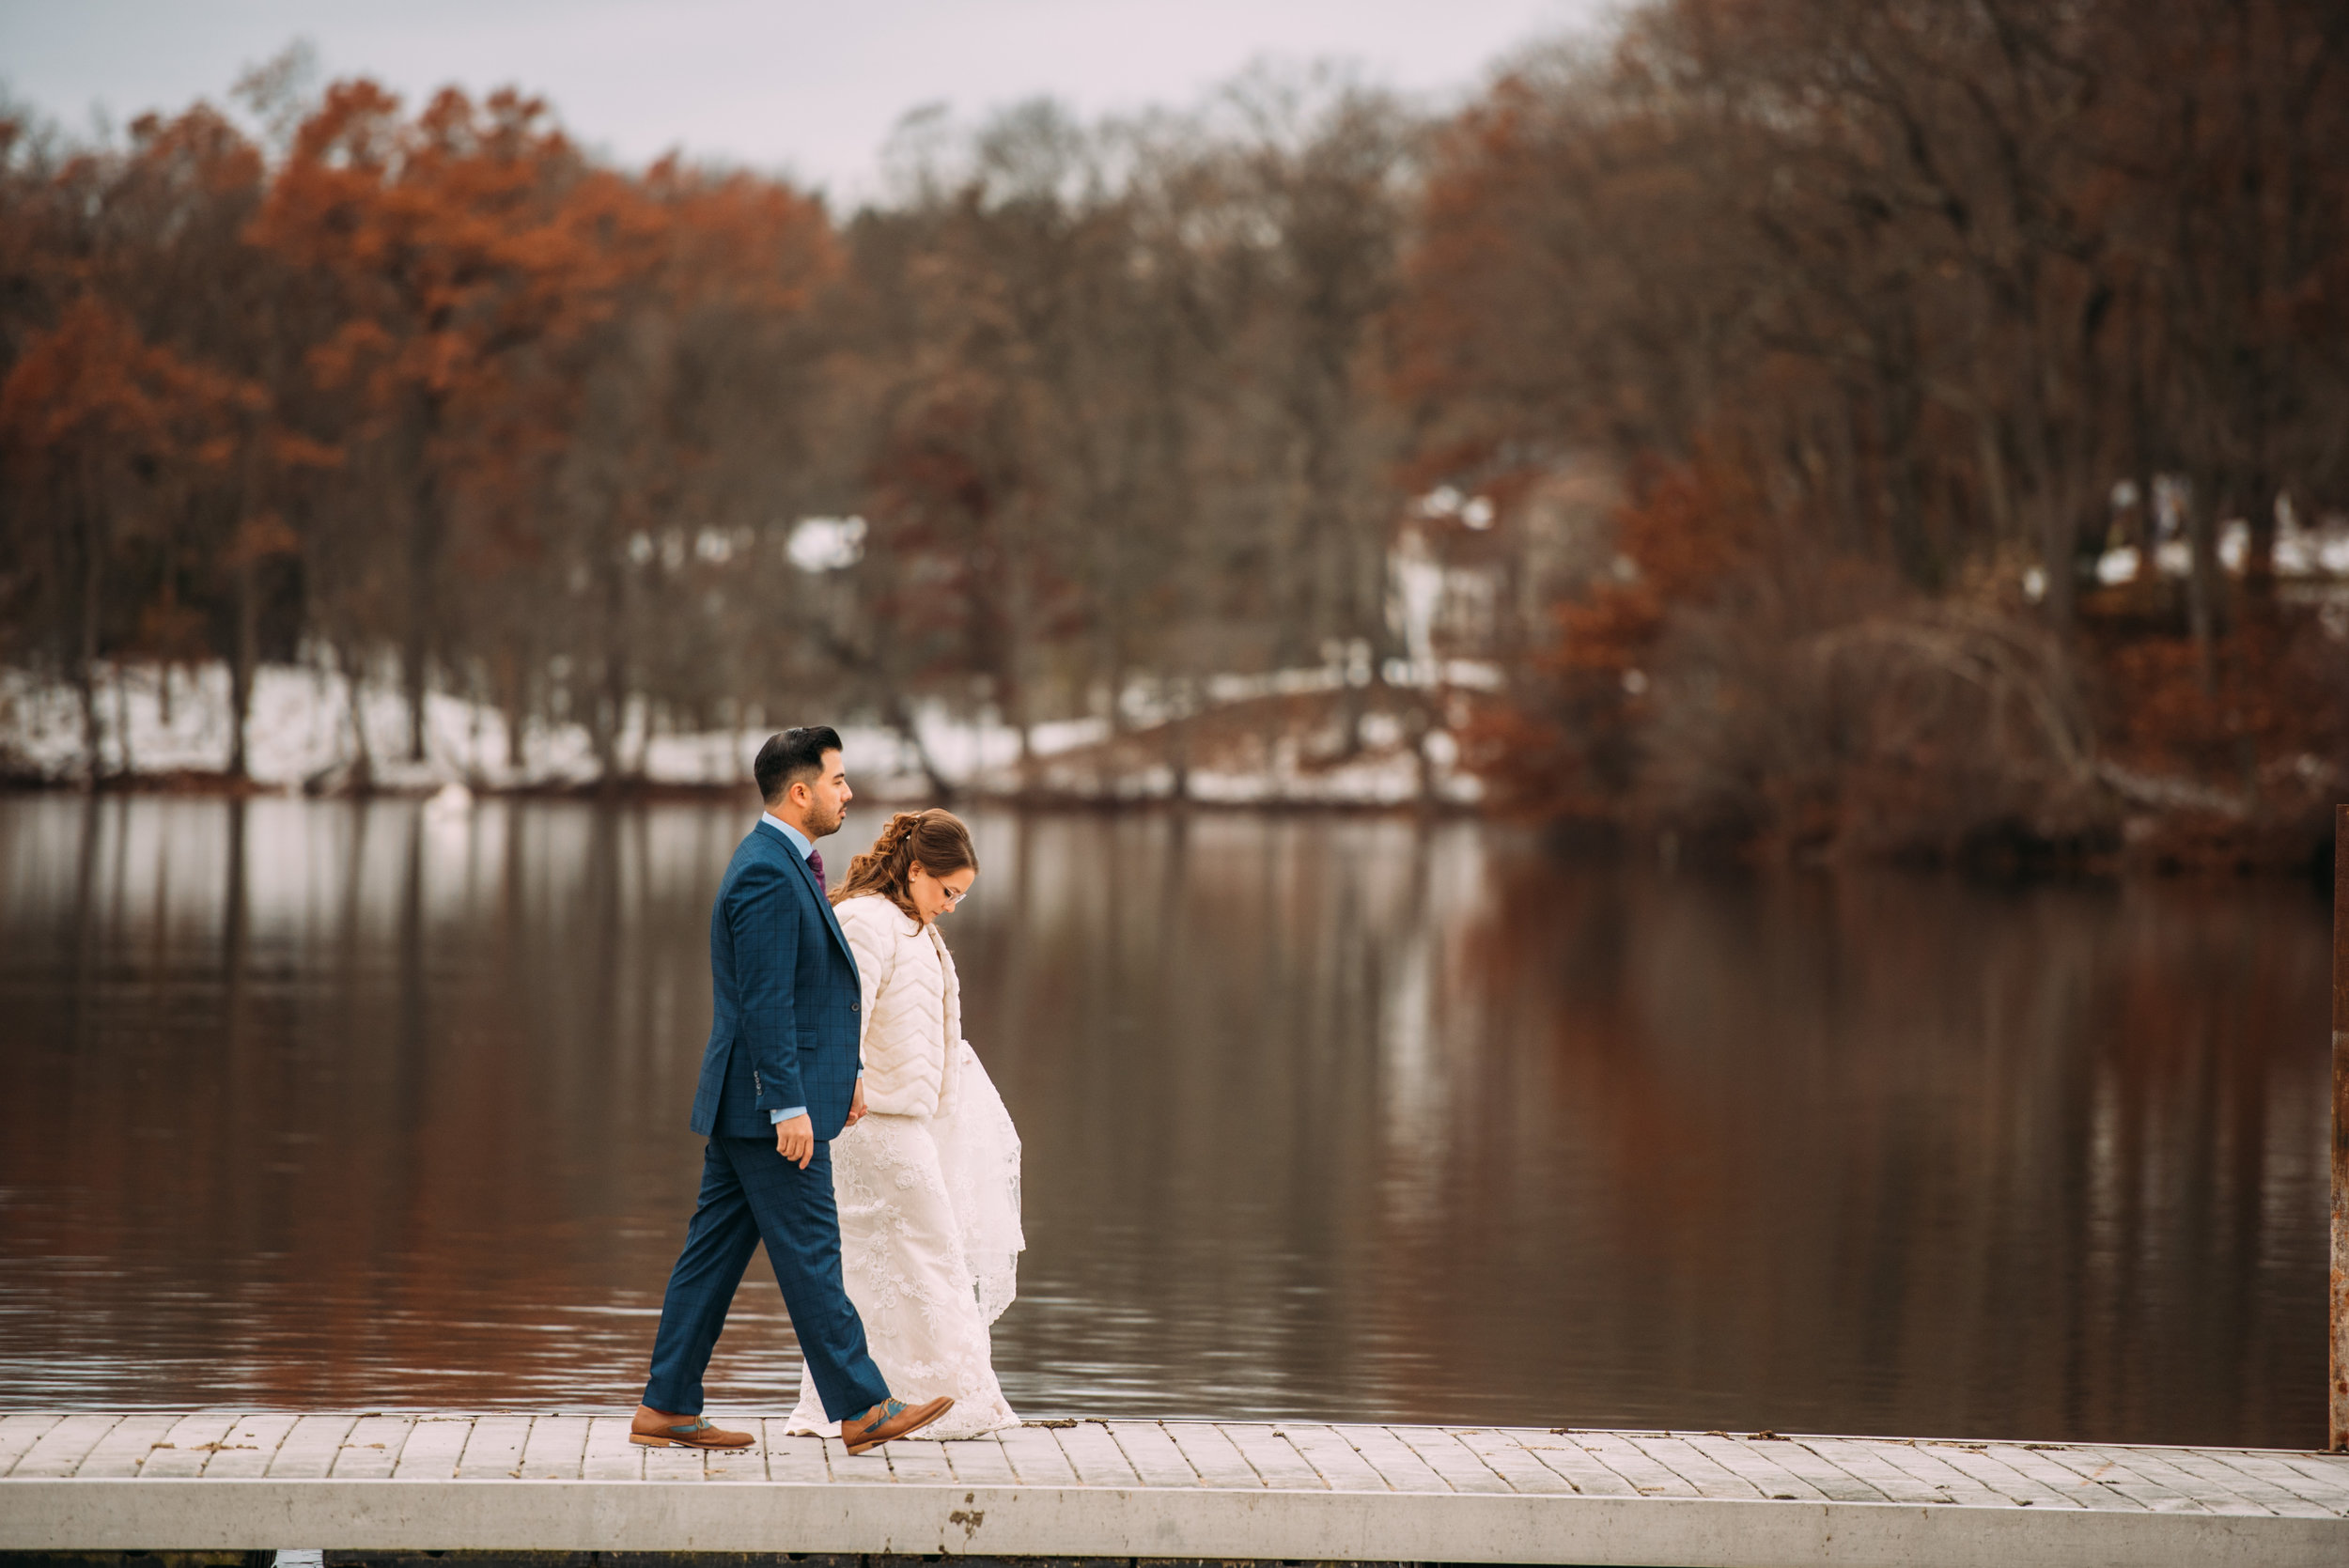 WeddingPhotos | NJPhotographer | Highlights-10-24.jpg